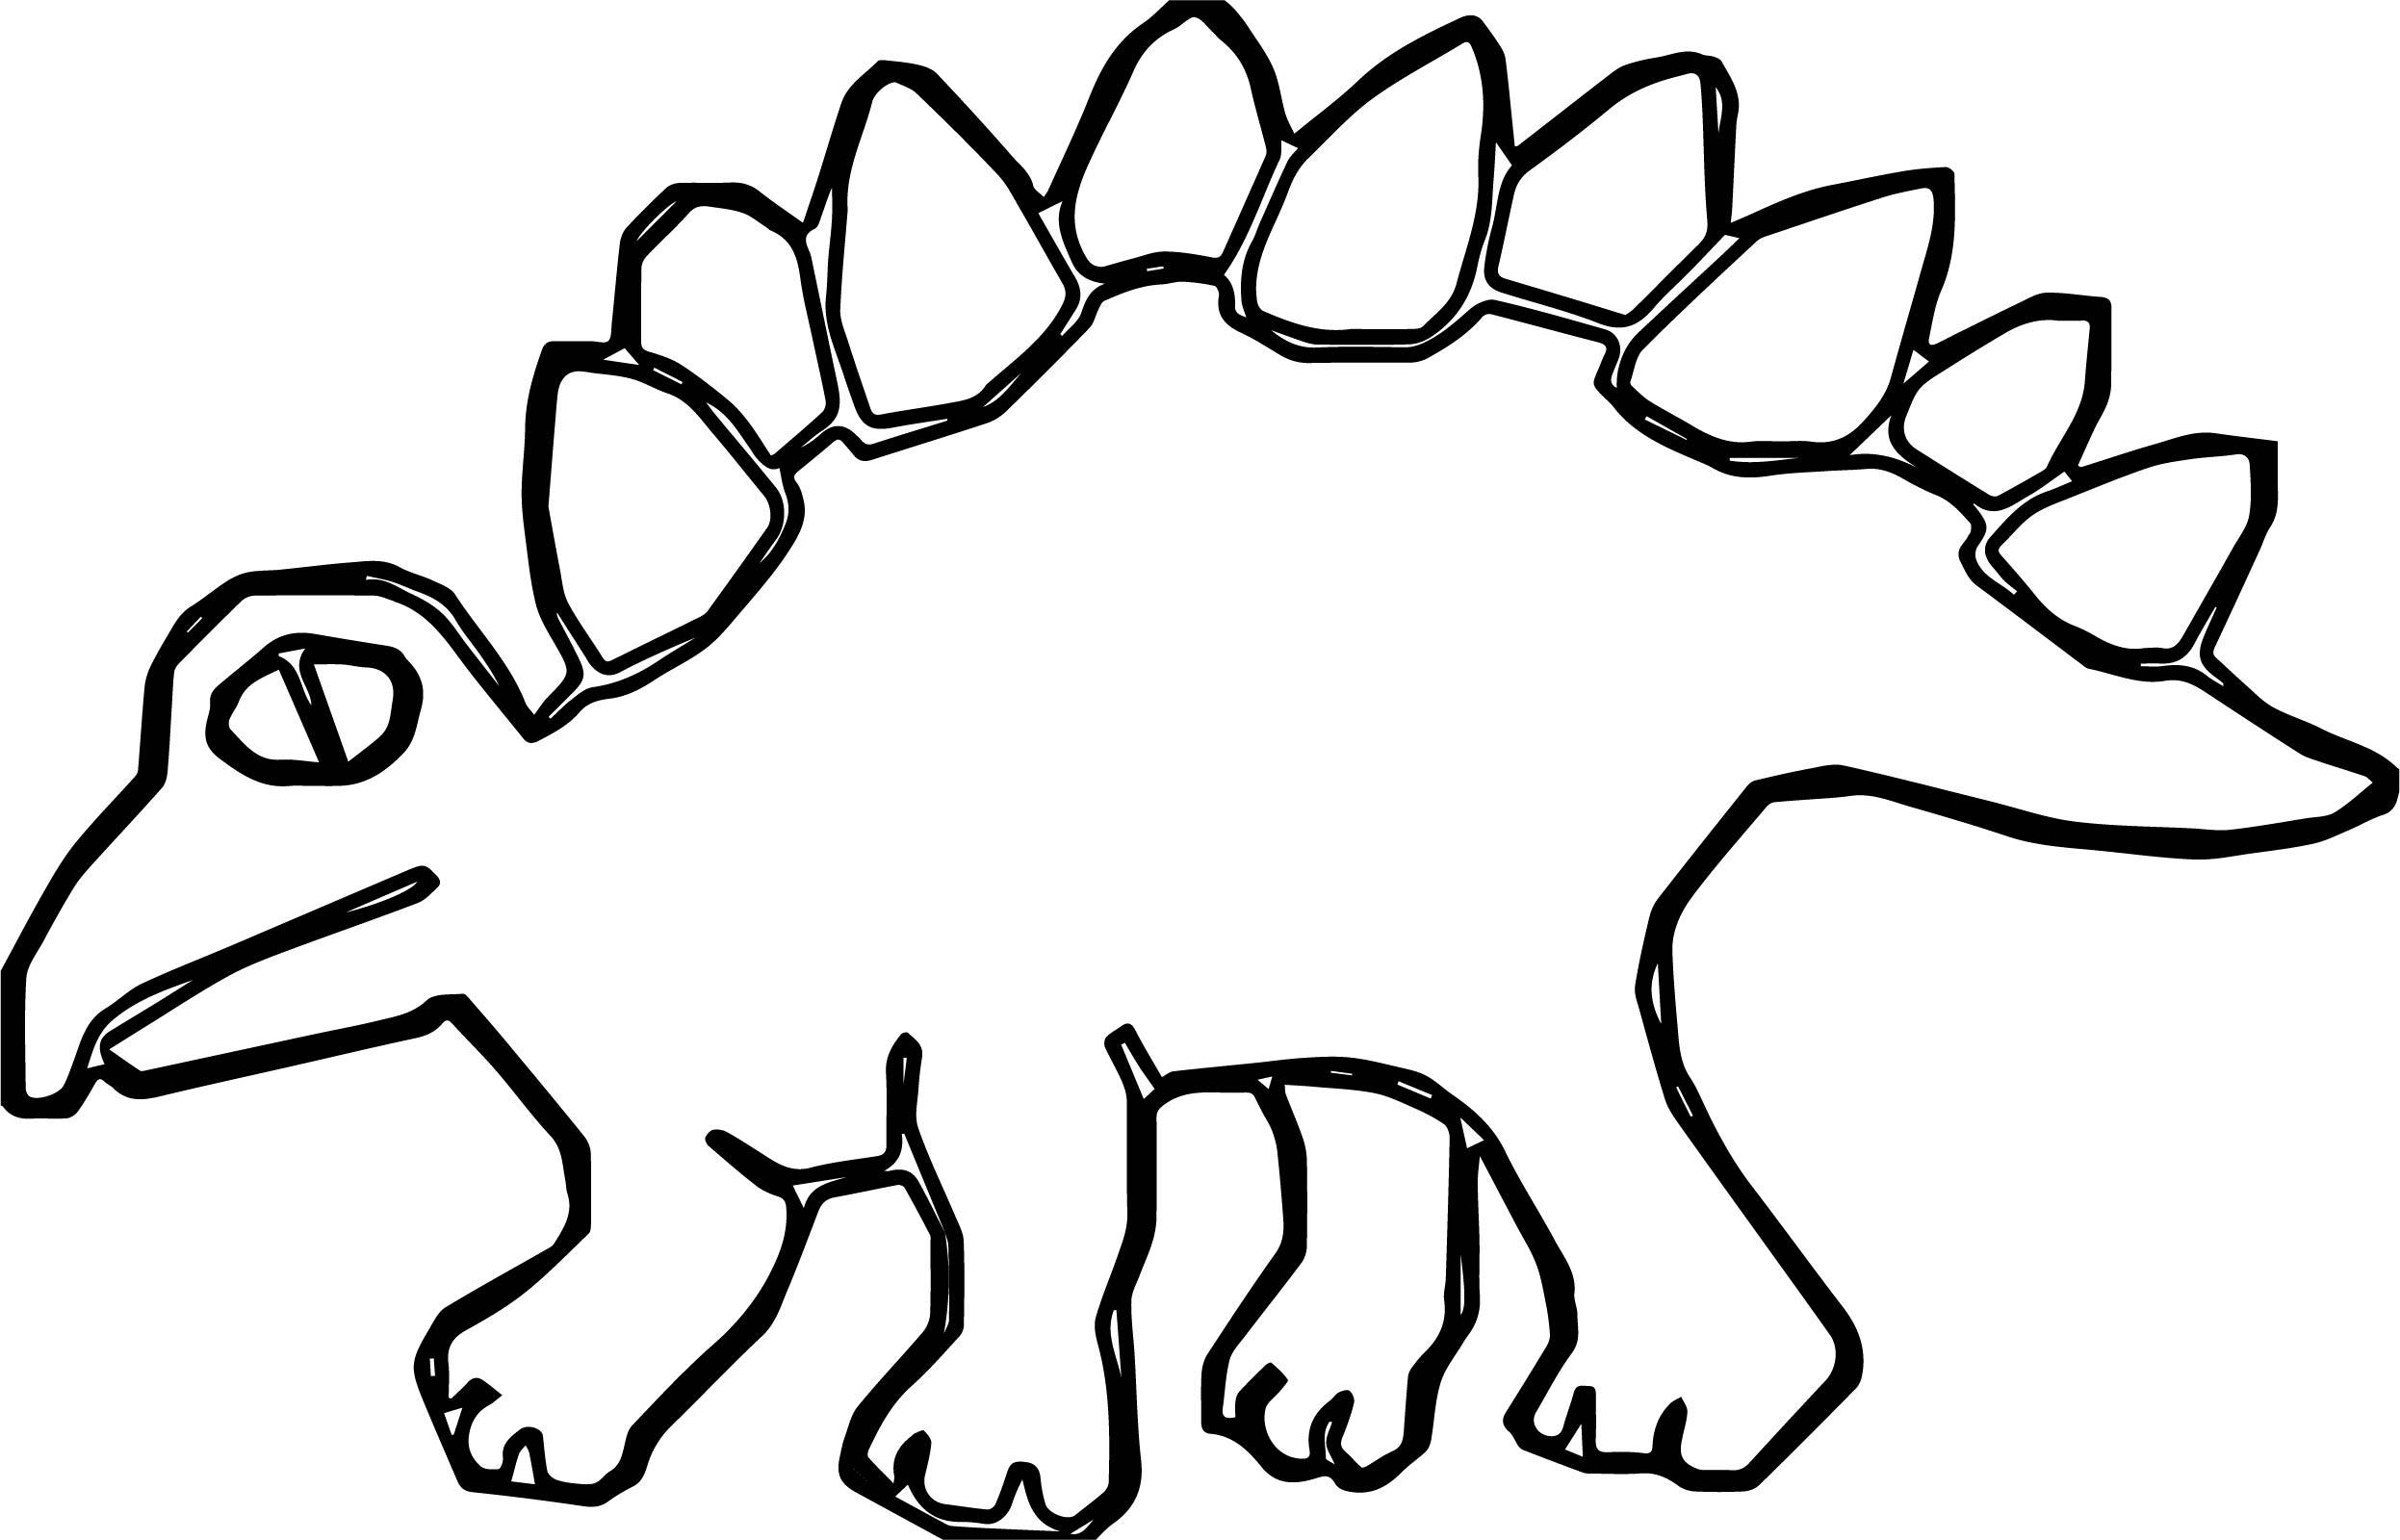 Green Art Dinosaur Stegosaurus Ancient Spikes Coloring Page